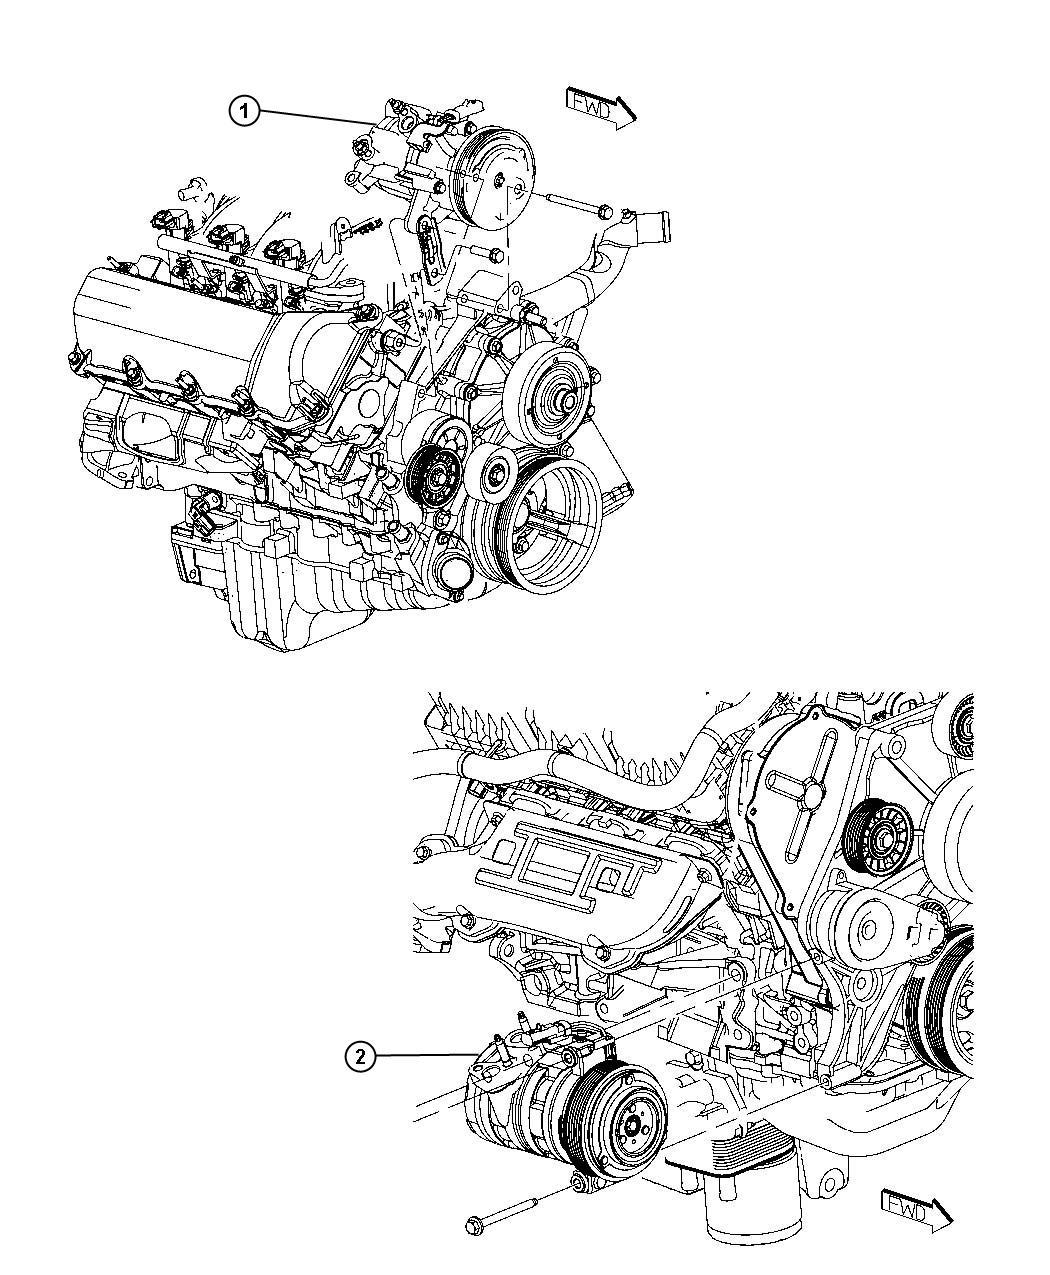 Dodge Nitro Compressor Air Conditioning Complete